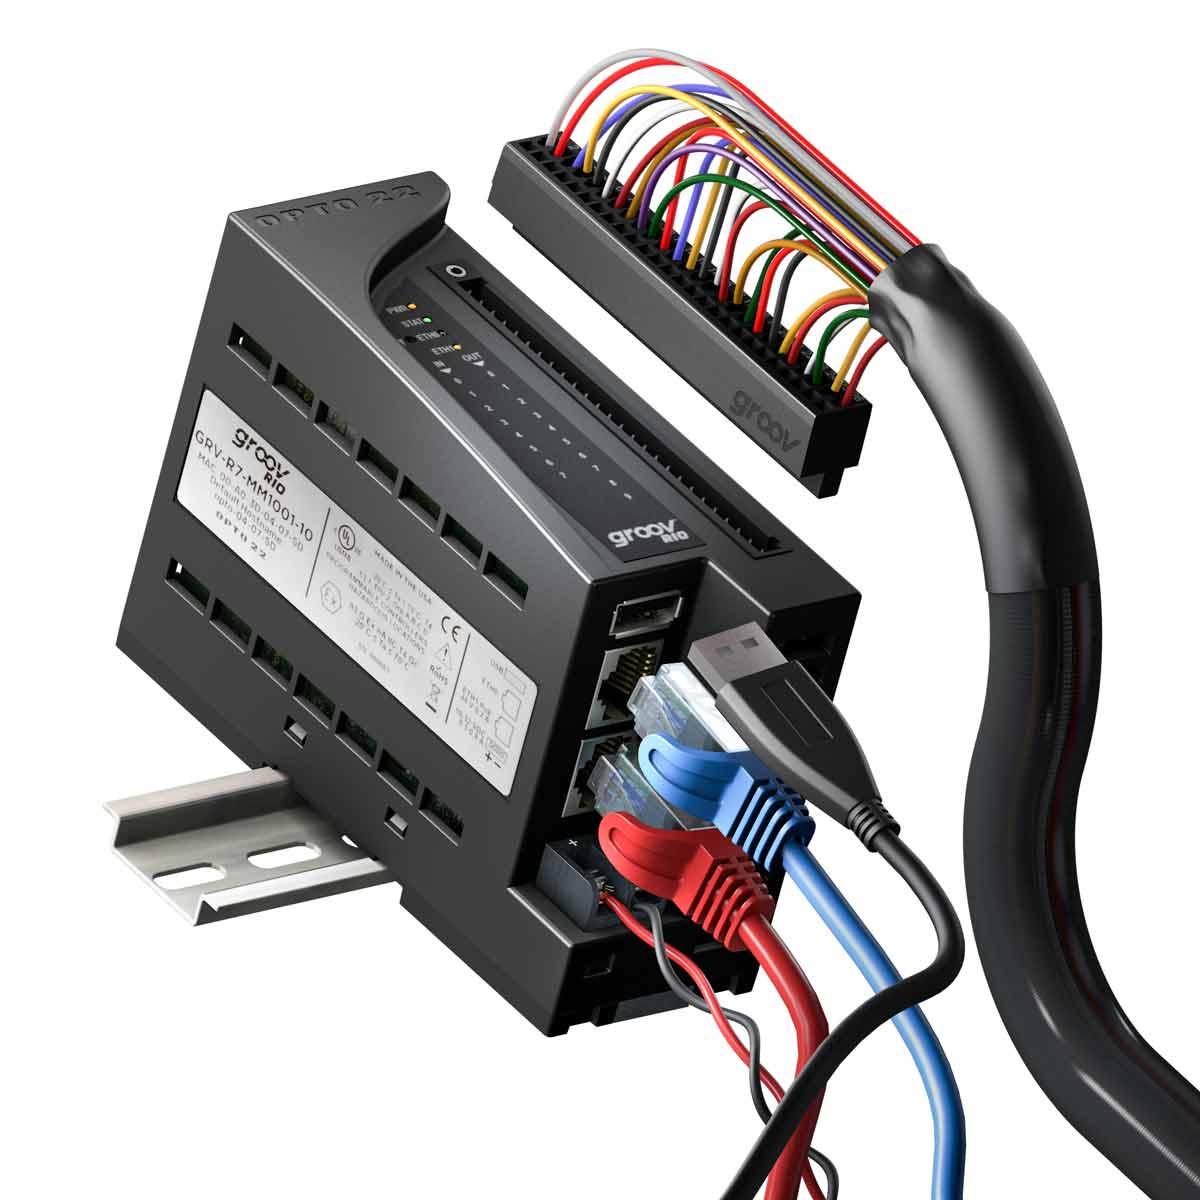 groov RIO wiring